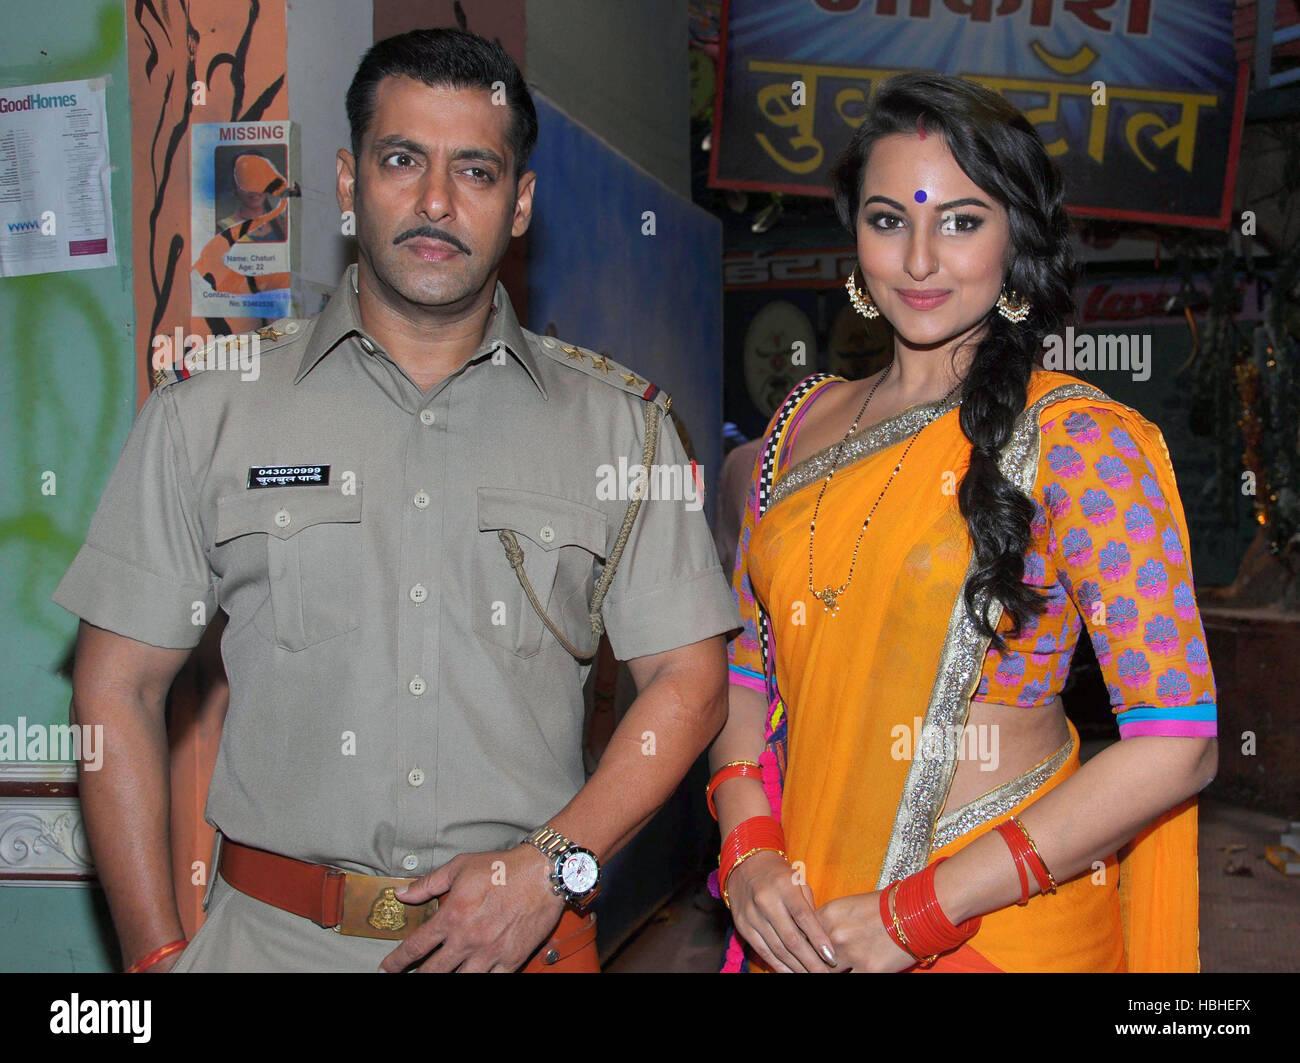 Les Acteurs De Bollywood Salman Khan Sonakshi Sinha Posent La